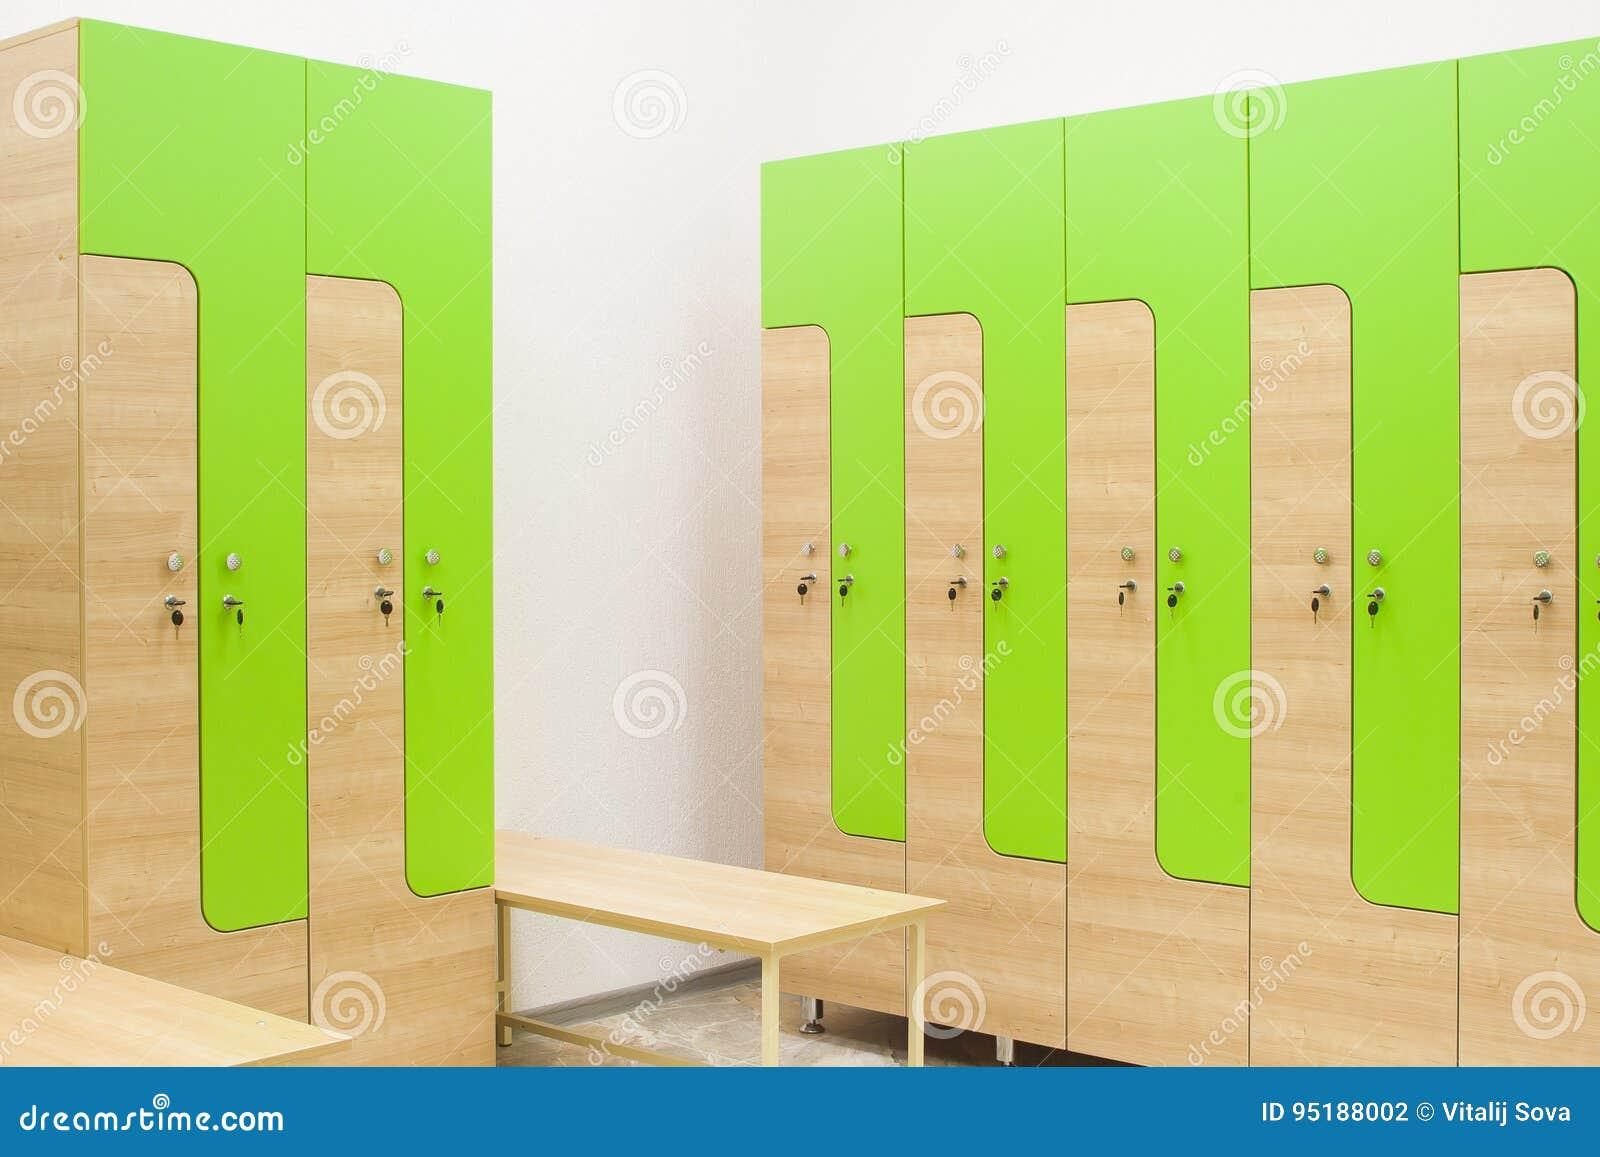 Strange Wardrobe In The Gym And Bench Stock Photo Image Of Design Machost Co Dining Chair Design Ideas Machostcouk